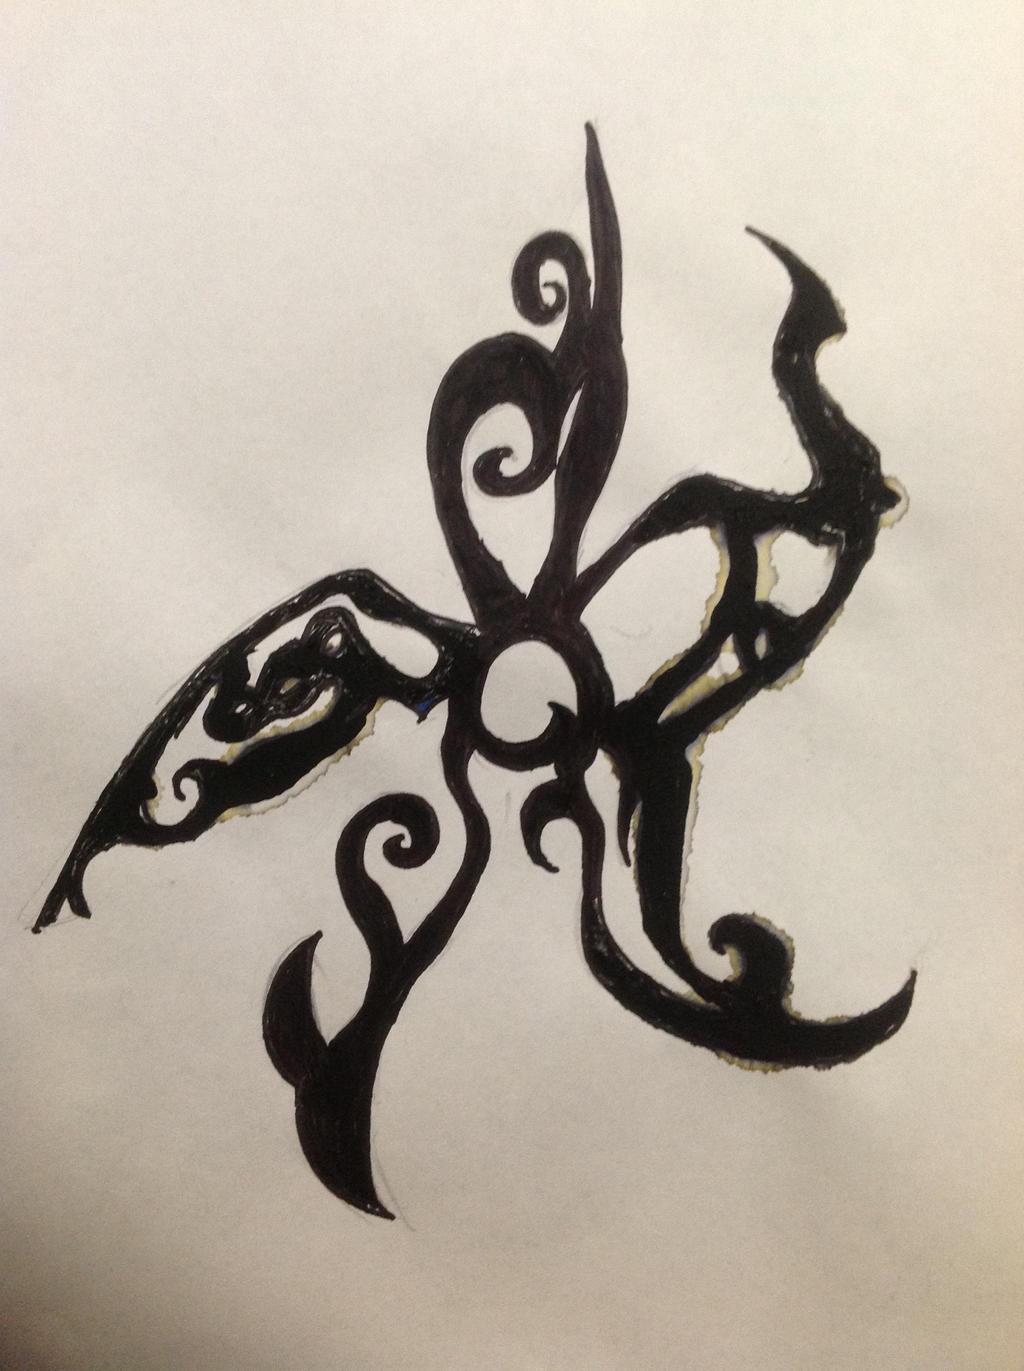 Maori Twist Tattoo: Twisted Maori Flower Tattoo Design By FemeItaly On DeviantArt